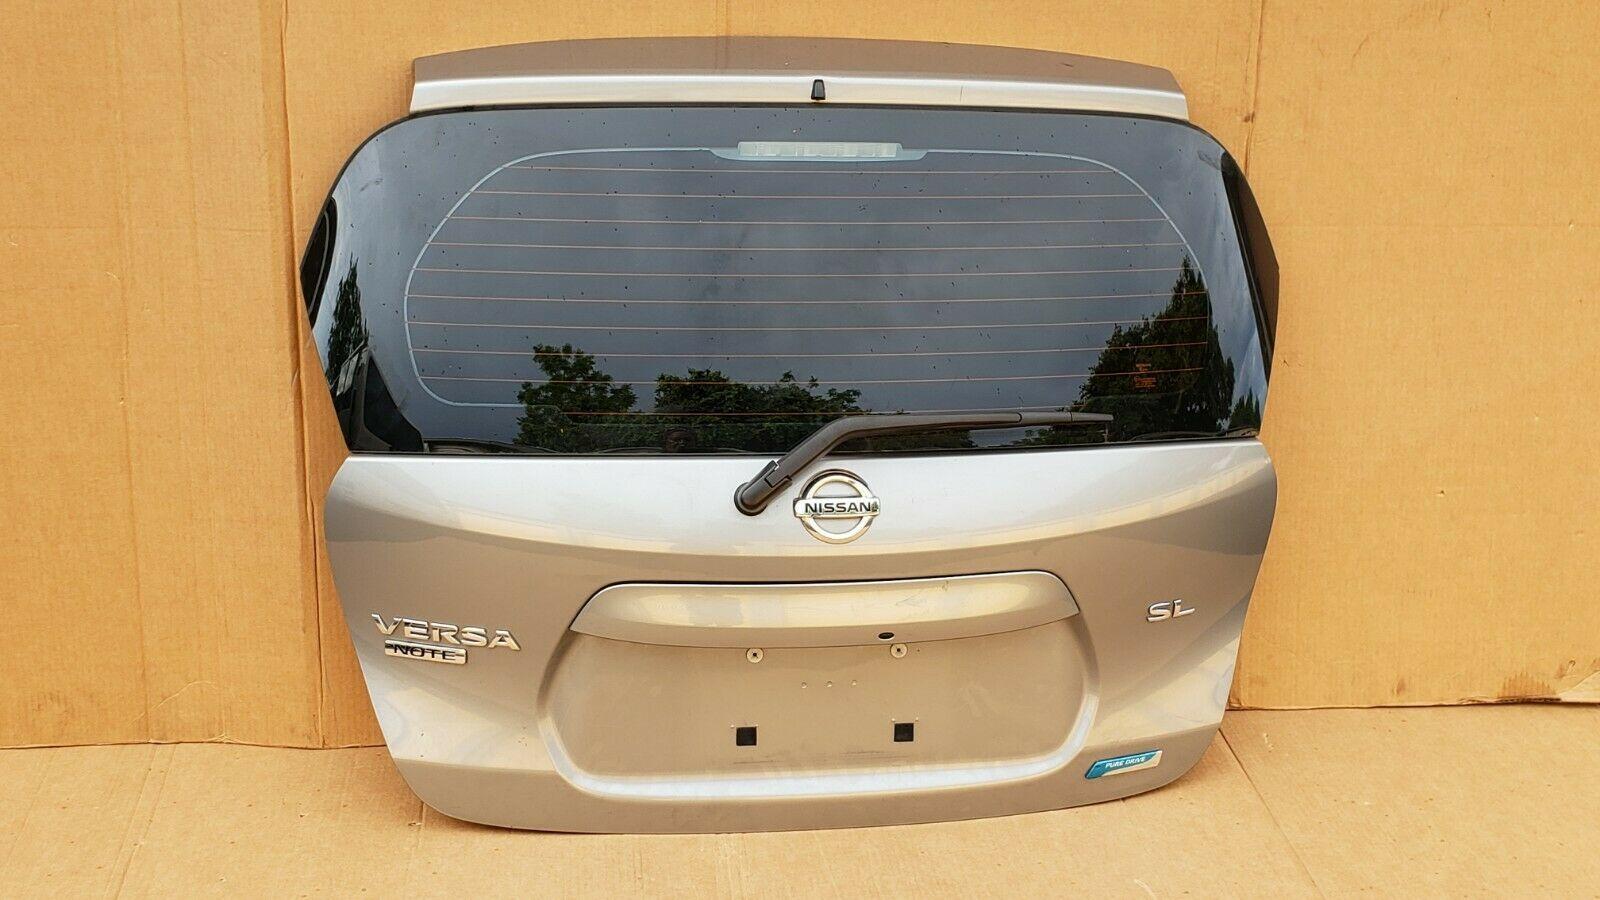 14-16 Nissan Versa Hatchback Rear Hatch Tailgate Liftgate Trunk Lid